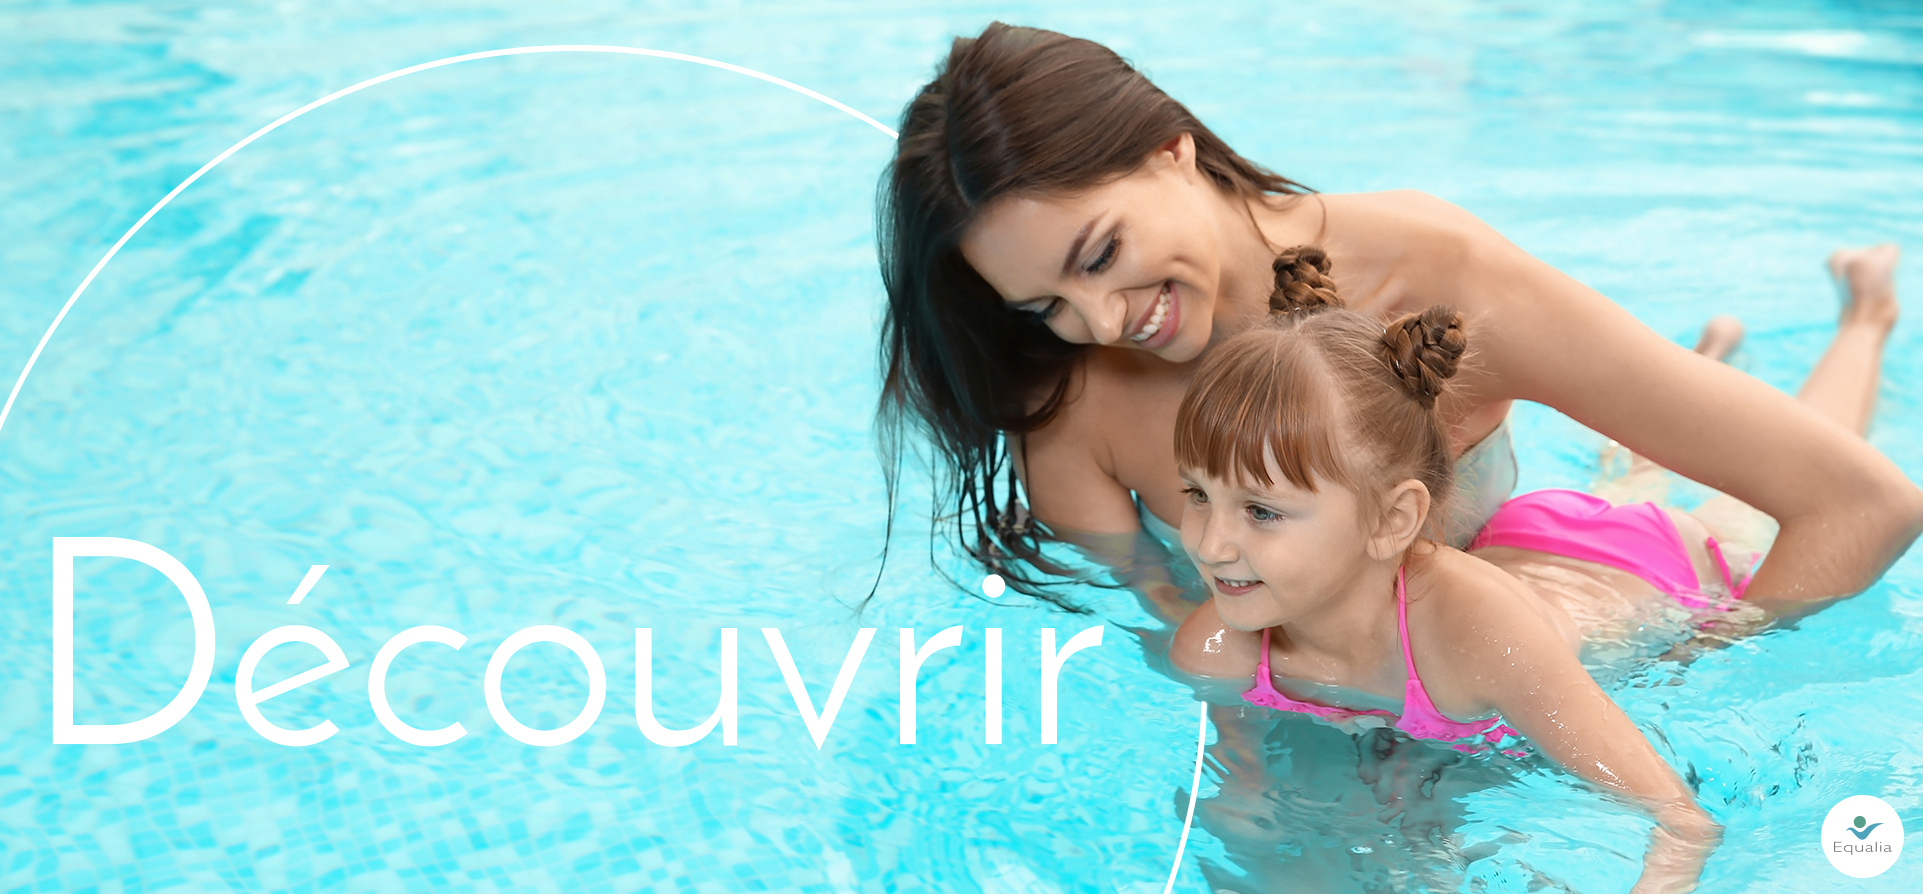 Accueil - Centre Aquatique Nymphéa À Moissy-Cramayel concernant Piscine De Moissy Cramayel